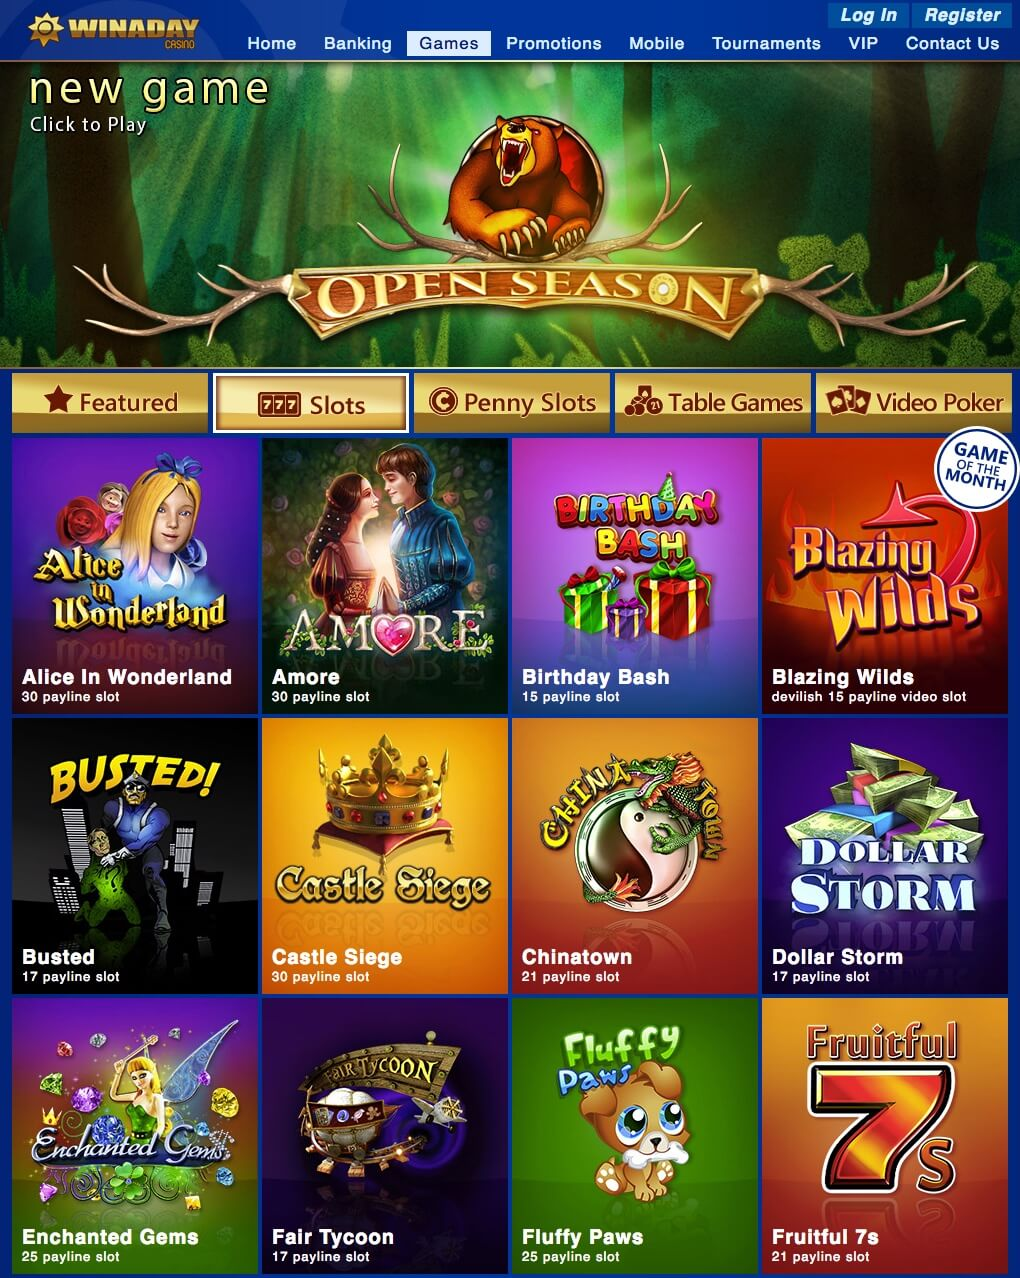 Winaday Casino Login